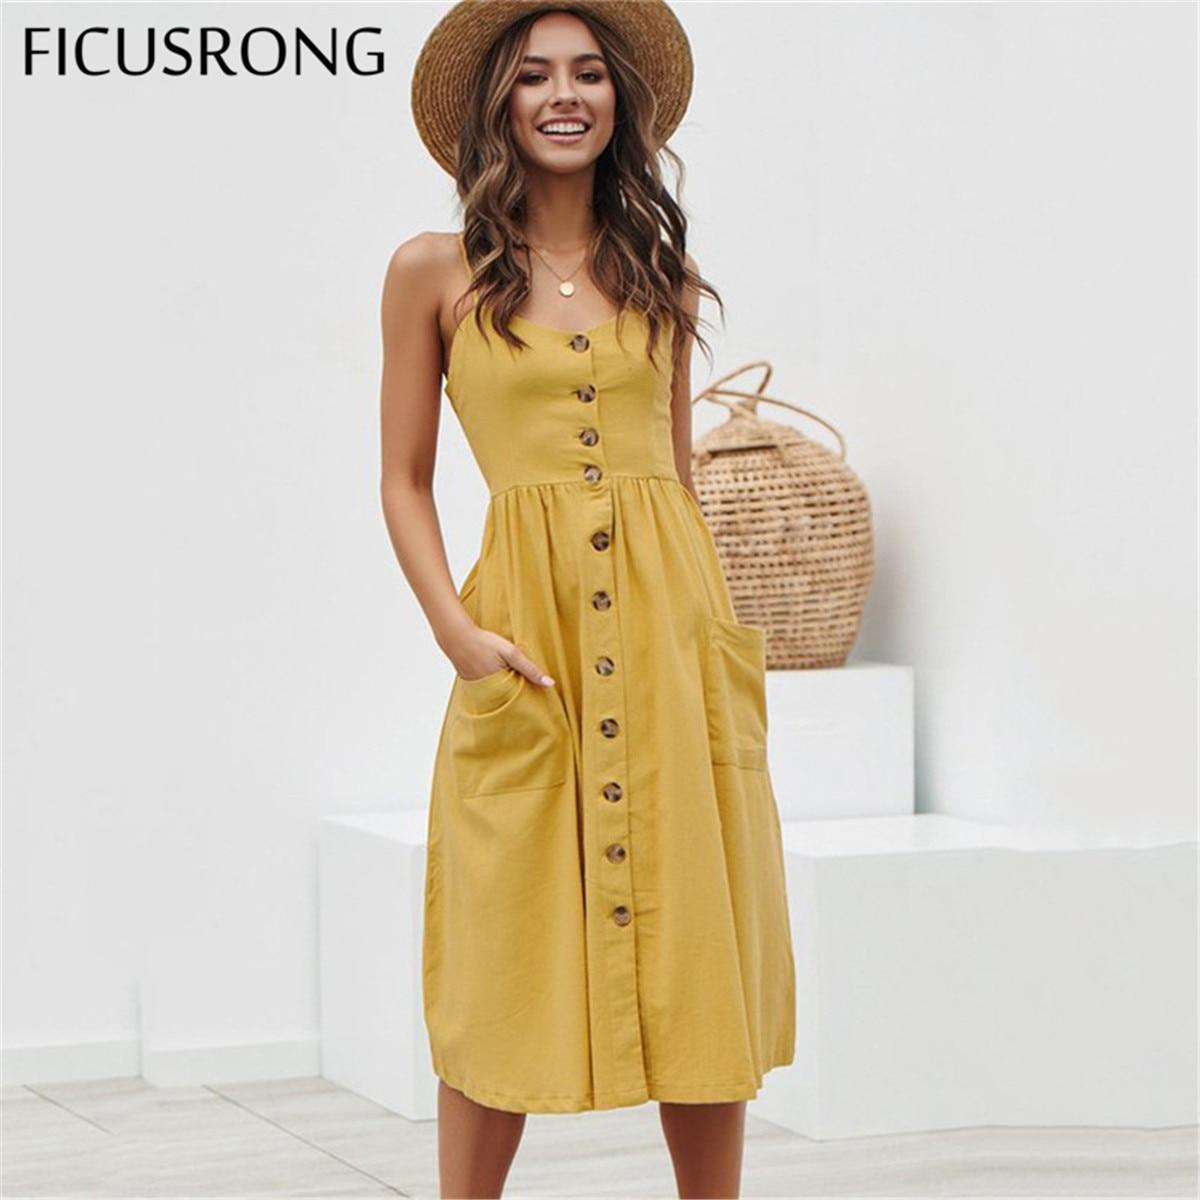 Elegant Button Women Dress Polka Dots Red Cotton Midi Dress 2019 Summer Casual Female Plus Size Lady Beach vestidos FICUSRONG 1